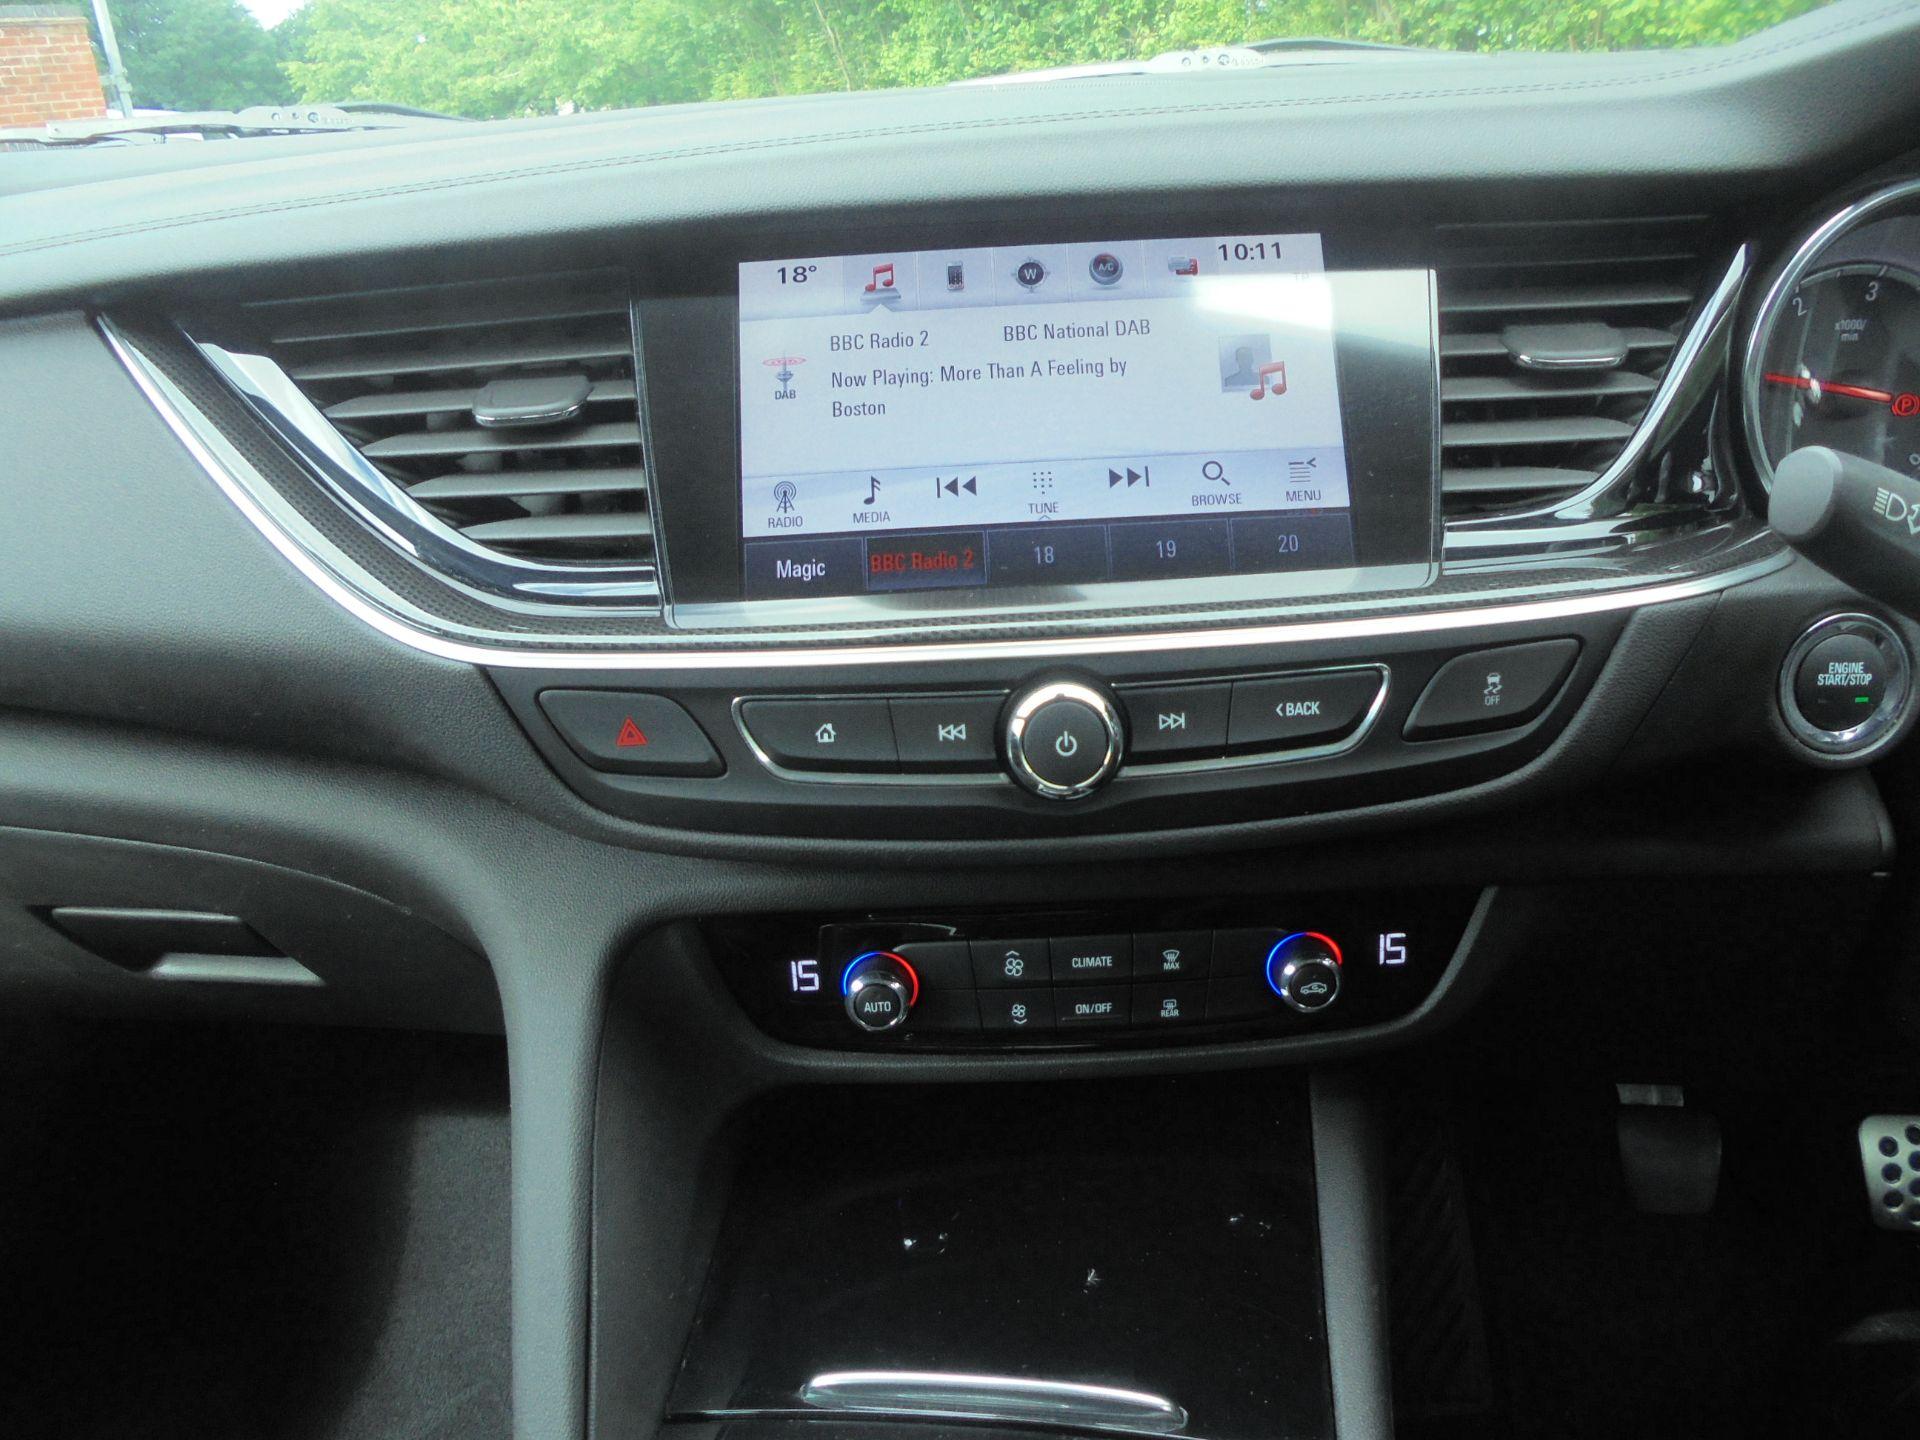 2018 Vauxhall Insignia 1.6 Grand Sport Turbo D Ecotec [136] Sri Nav 5Dr (VU18DFG) Image 15